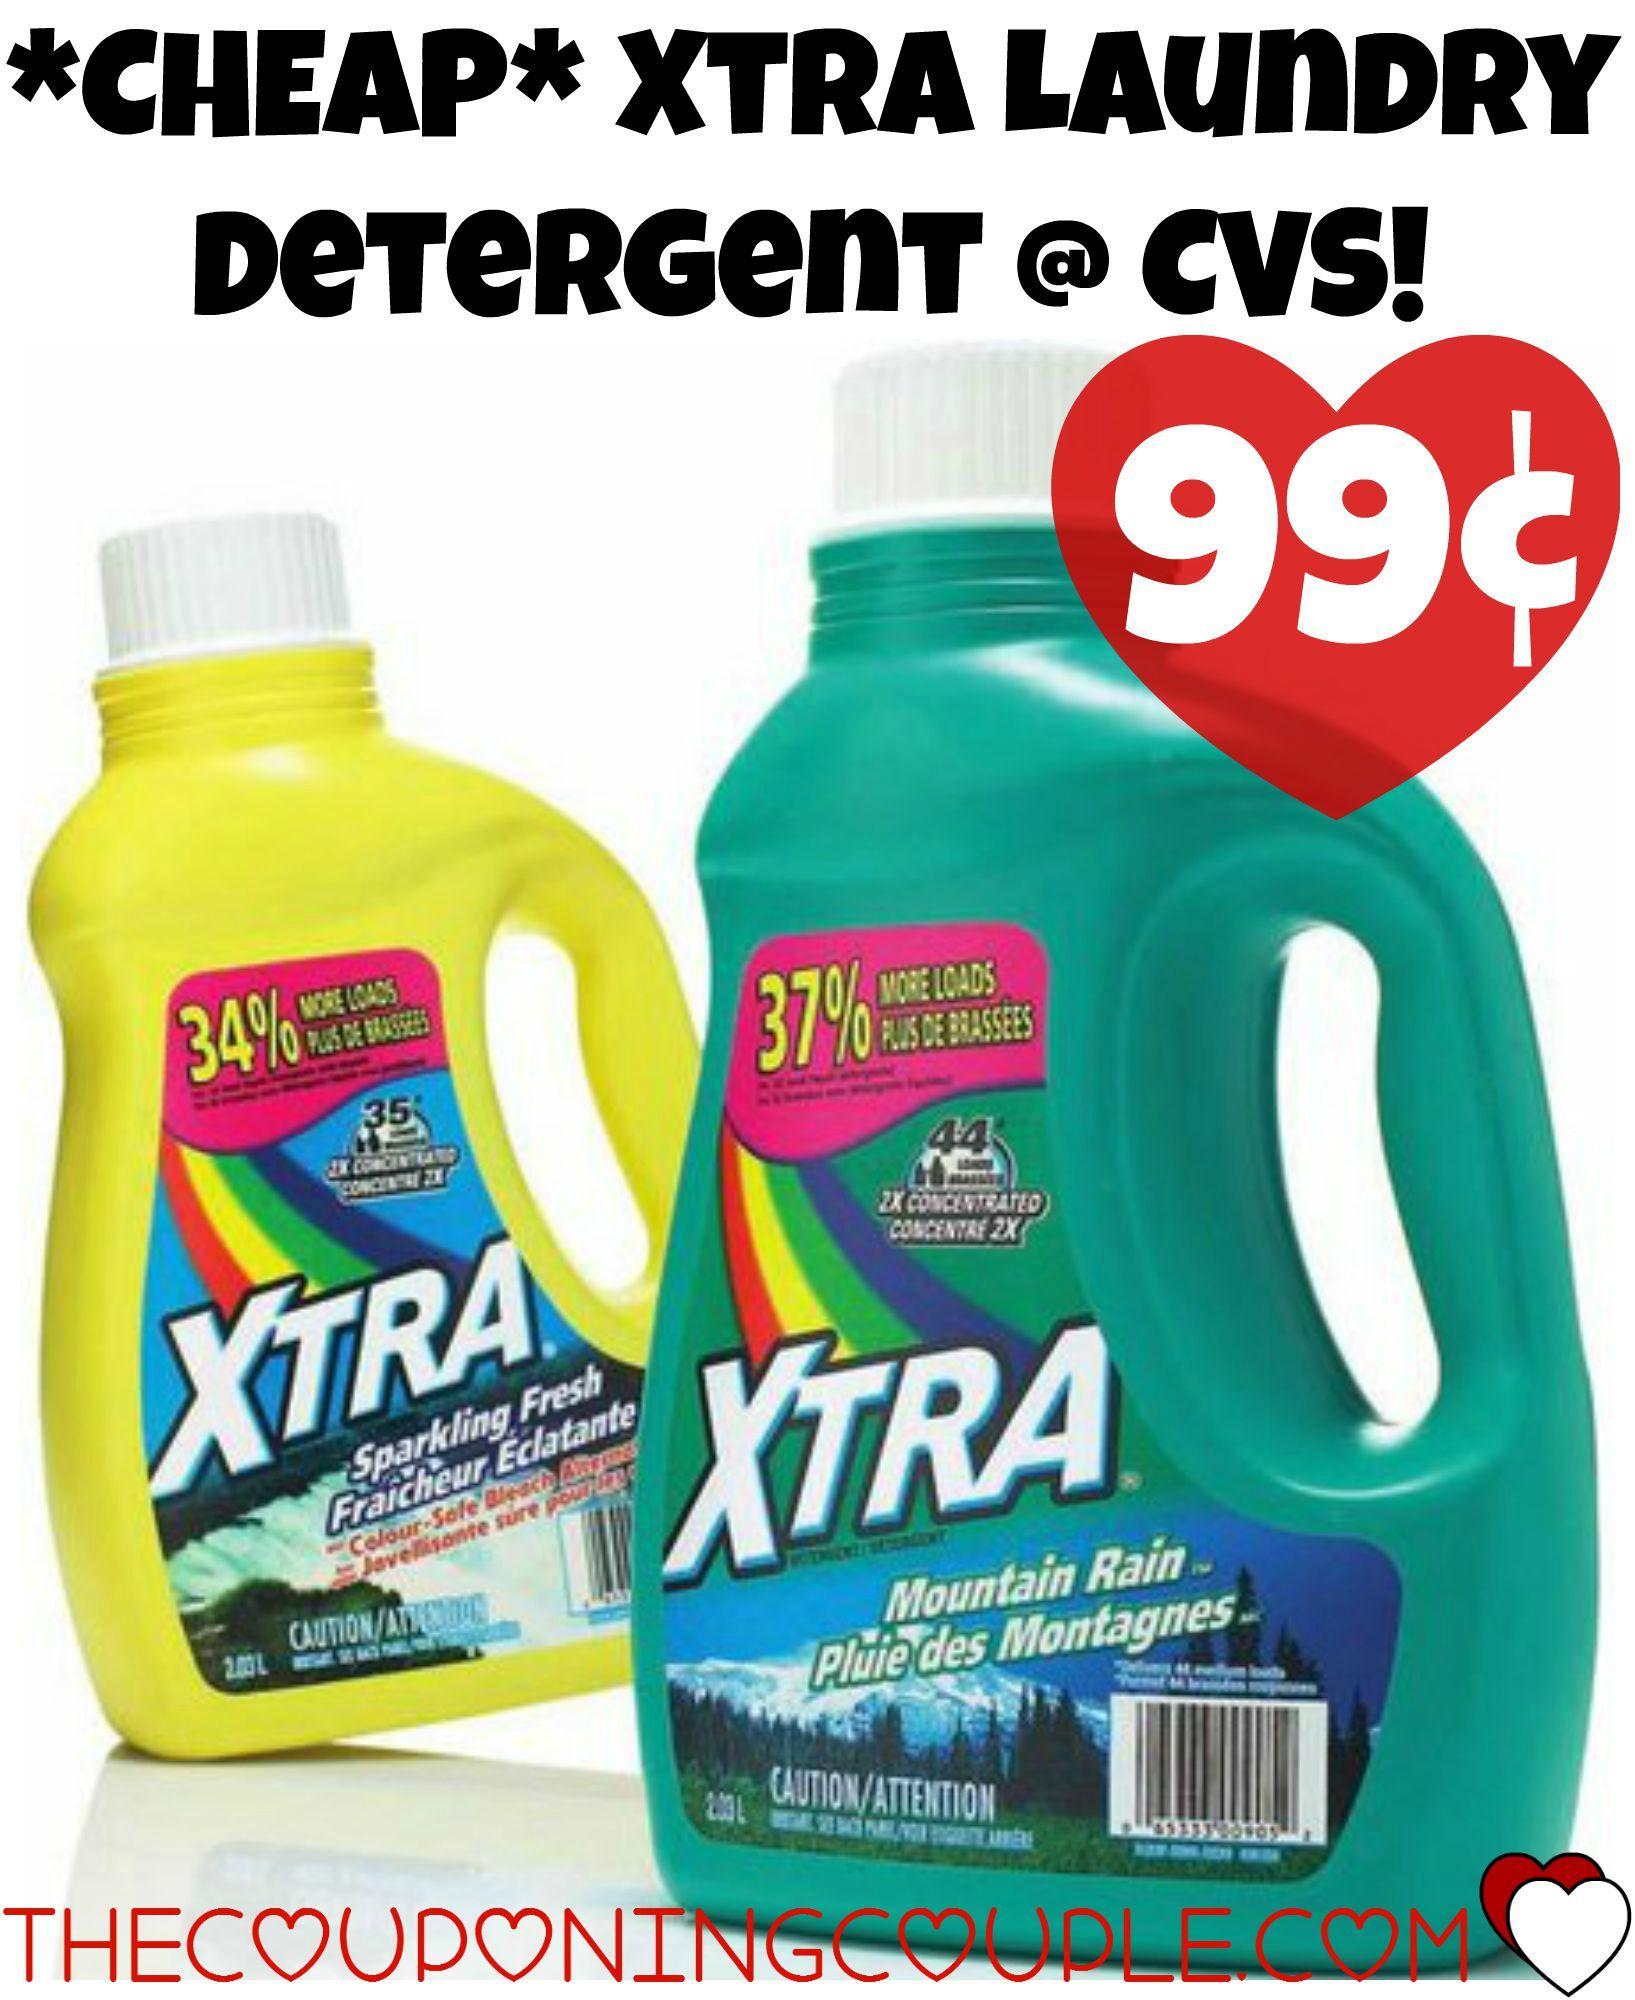 Cheap Xtra Laundry Detergent Cvs Just 0 99 Xtra Detergent